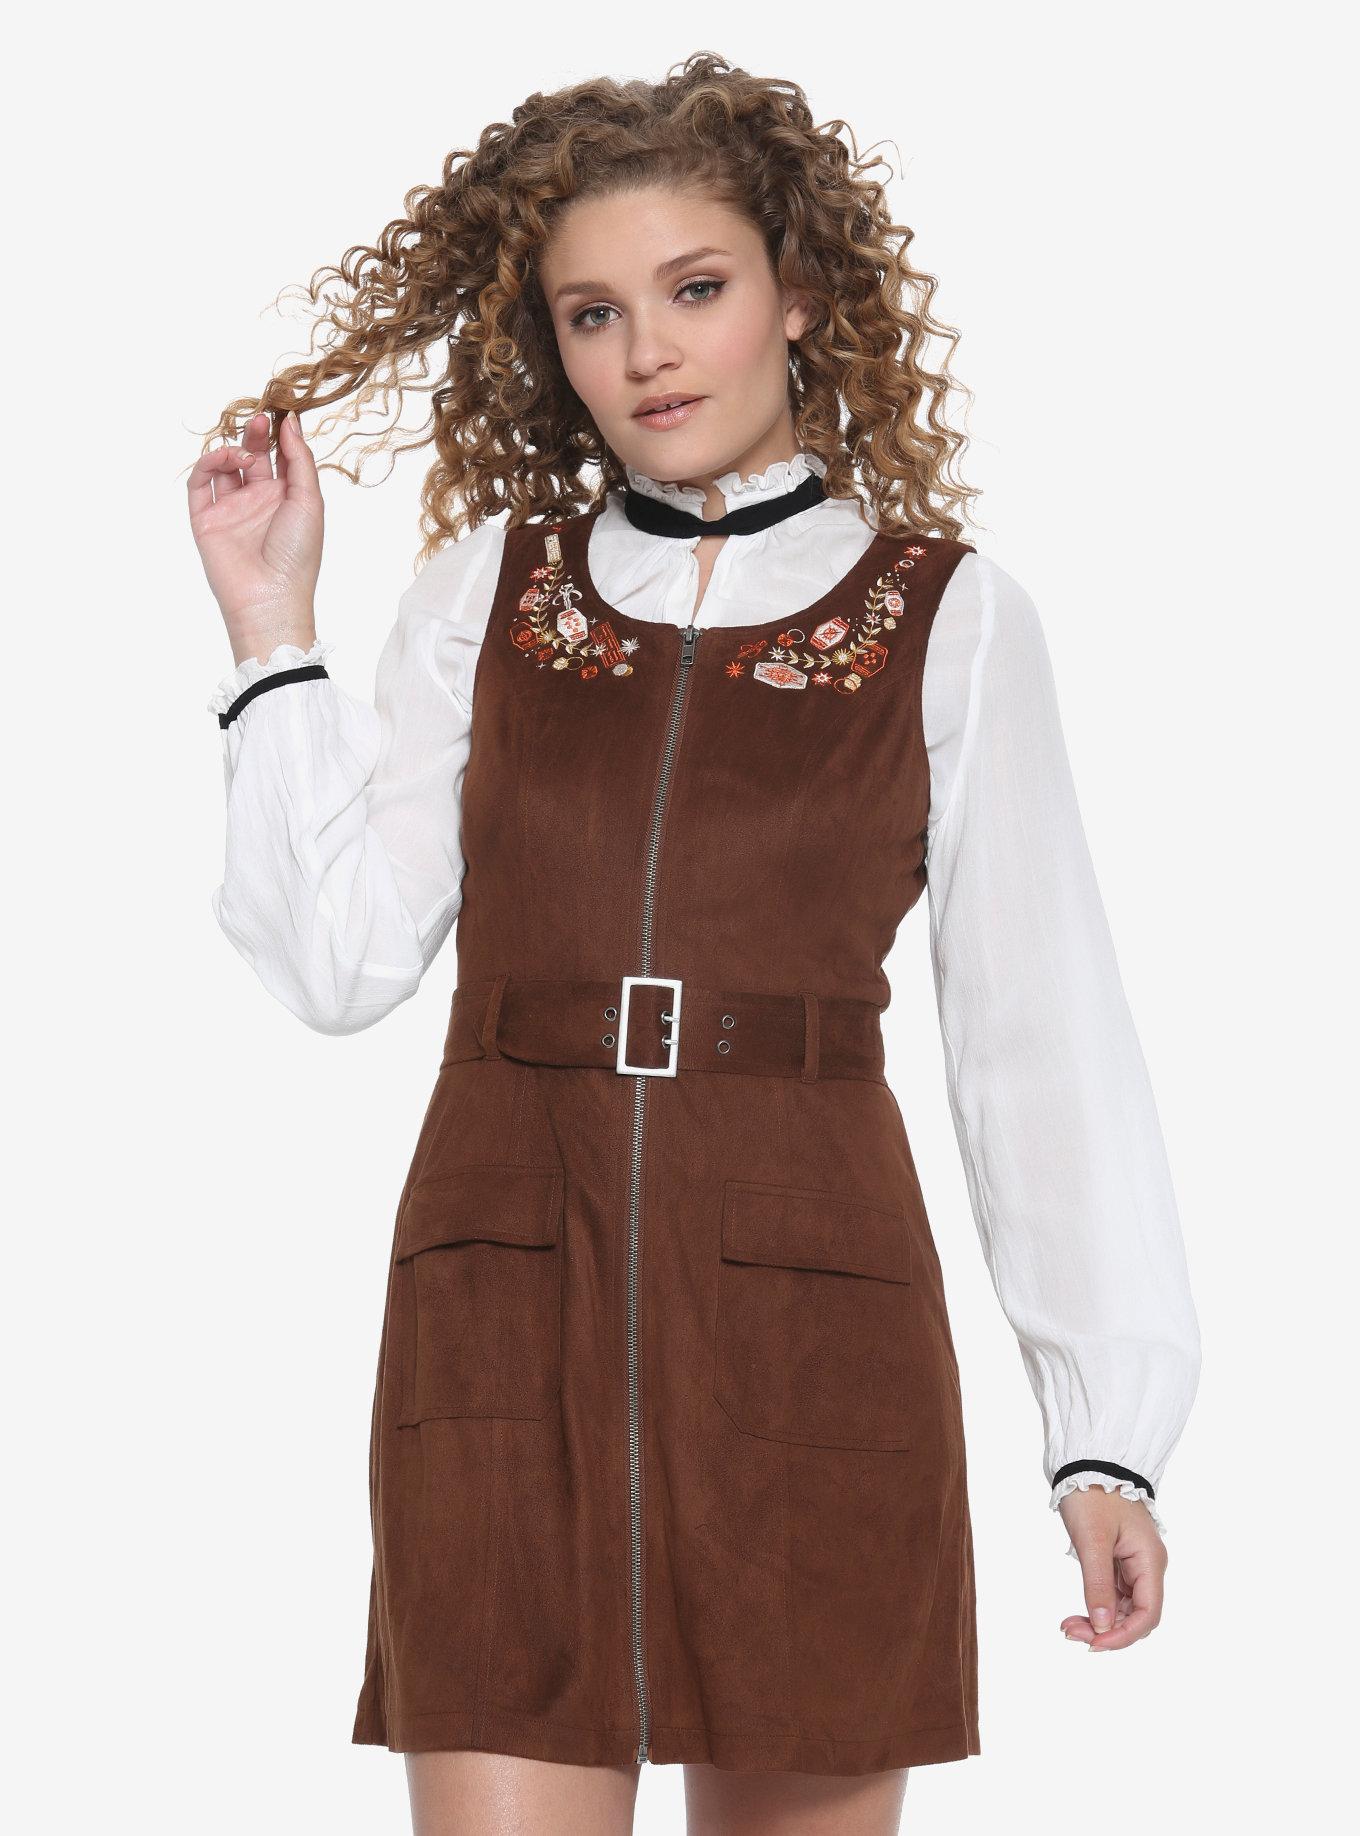 solo-zipper-dress.jpeg